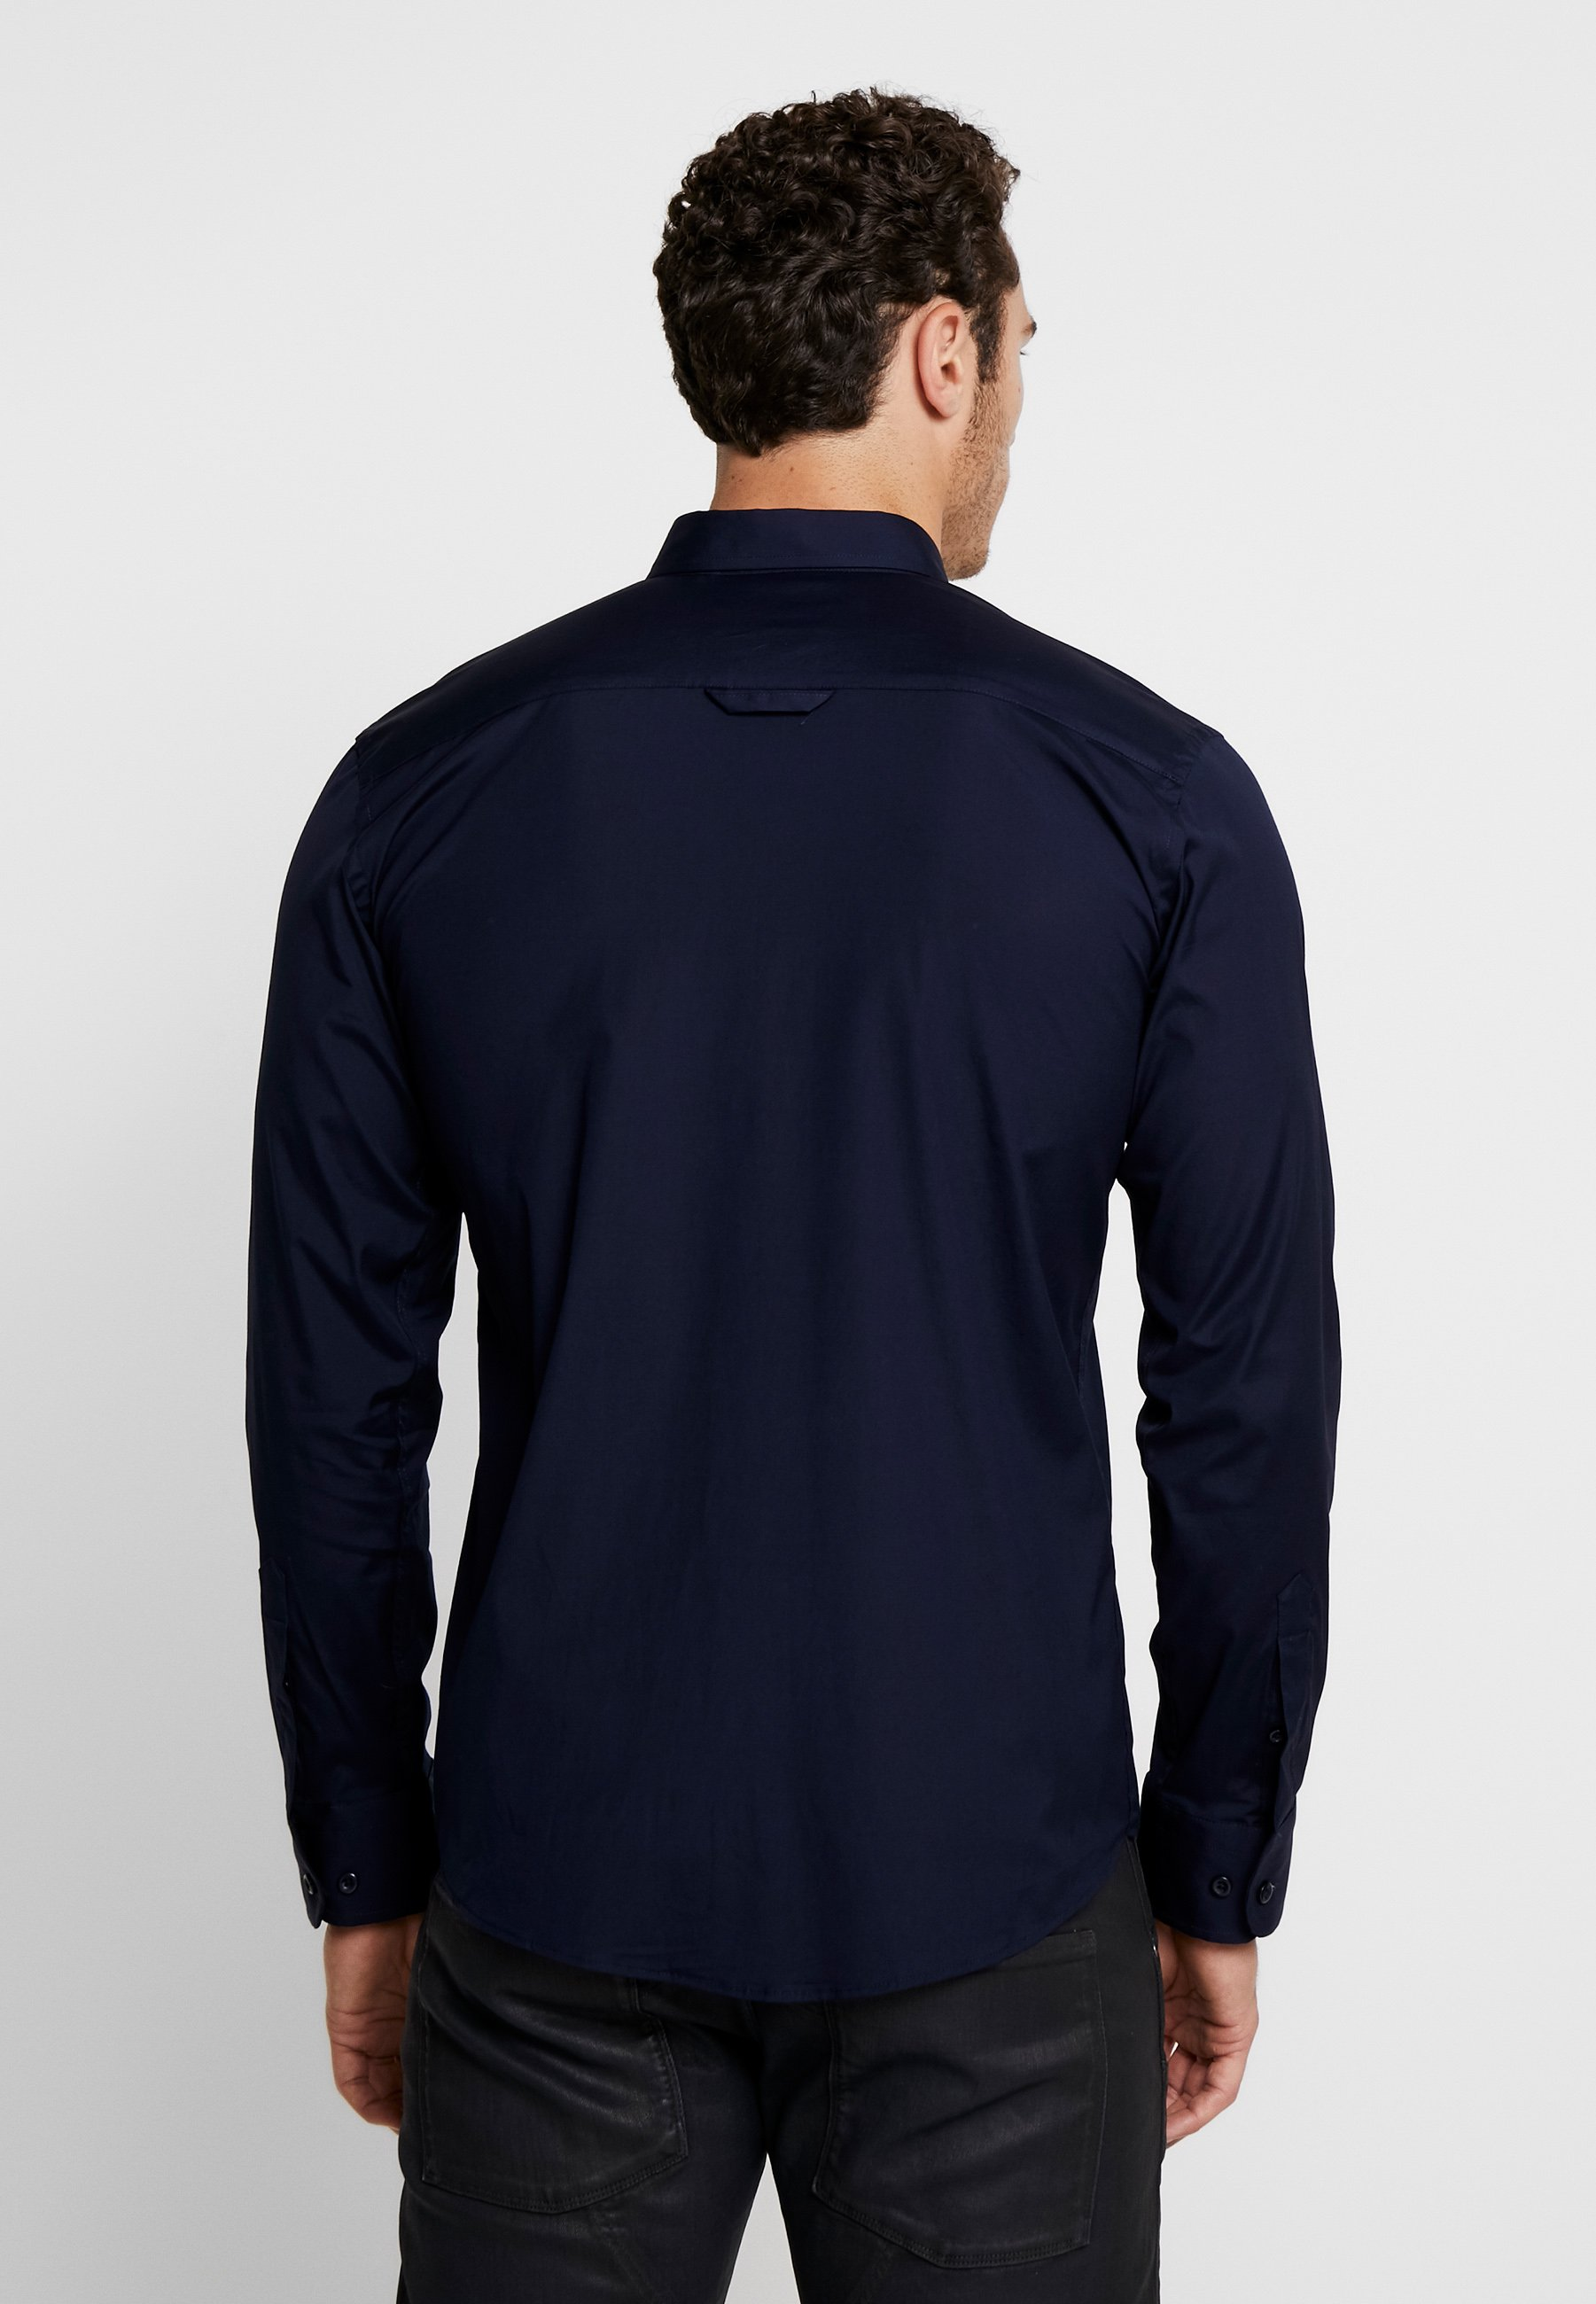 Organic By Dark Blue Garment Makers ShirtChemise The SUzVqMGp